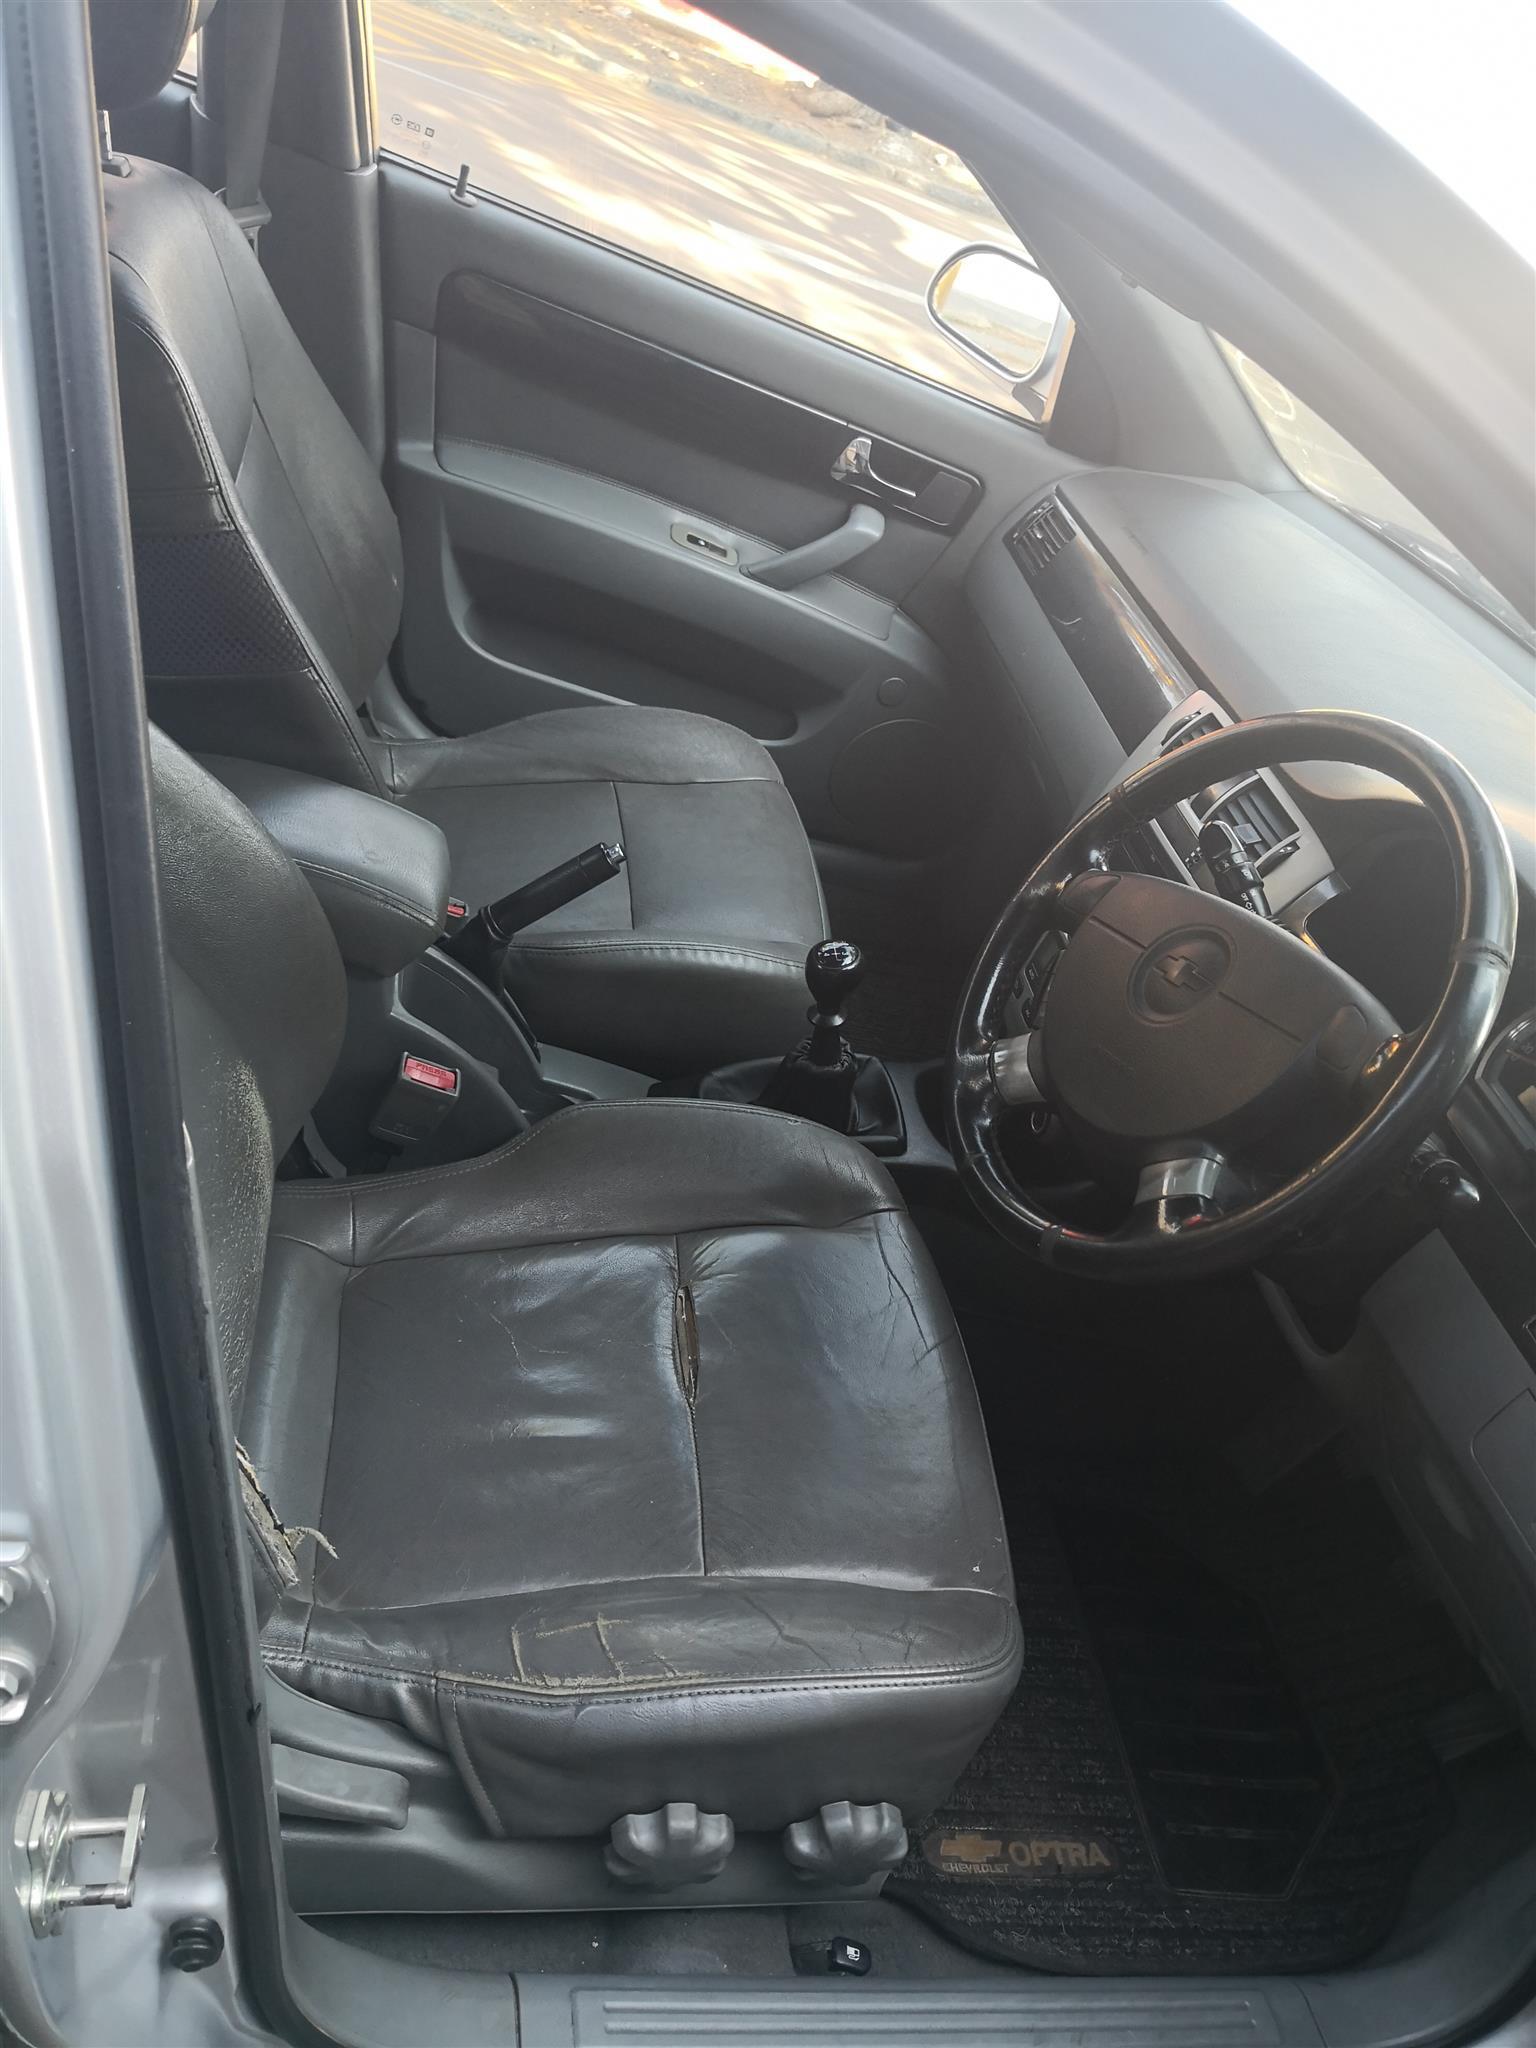 2009 Chevrolet Optra 1.8 LT